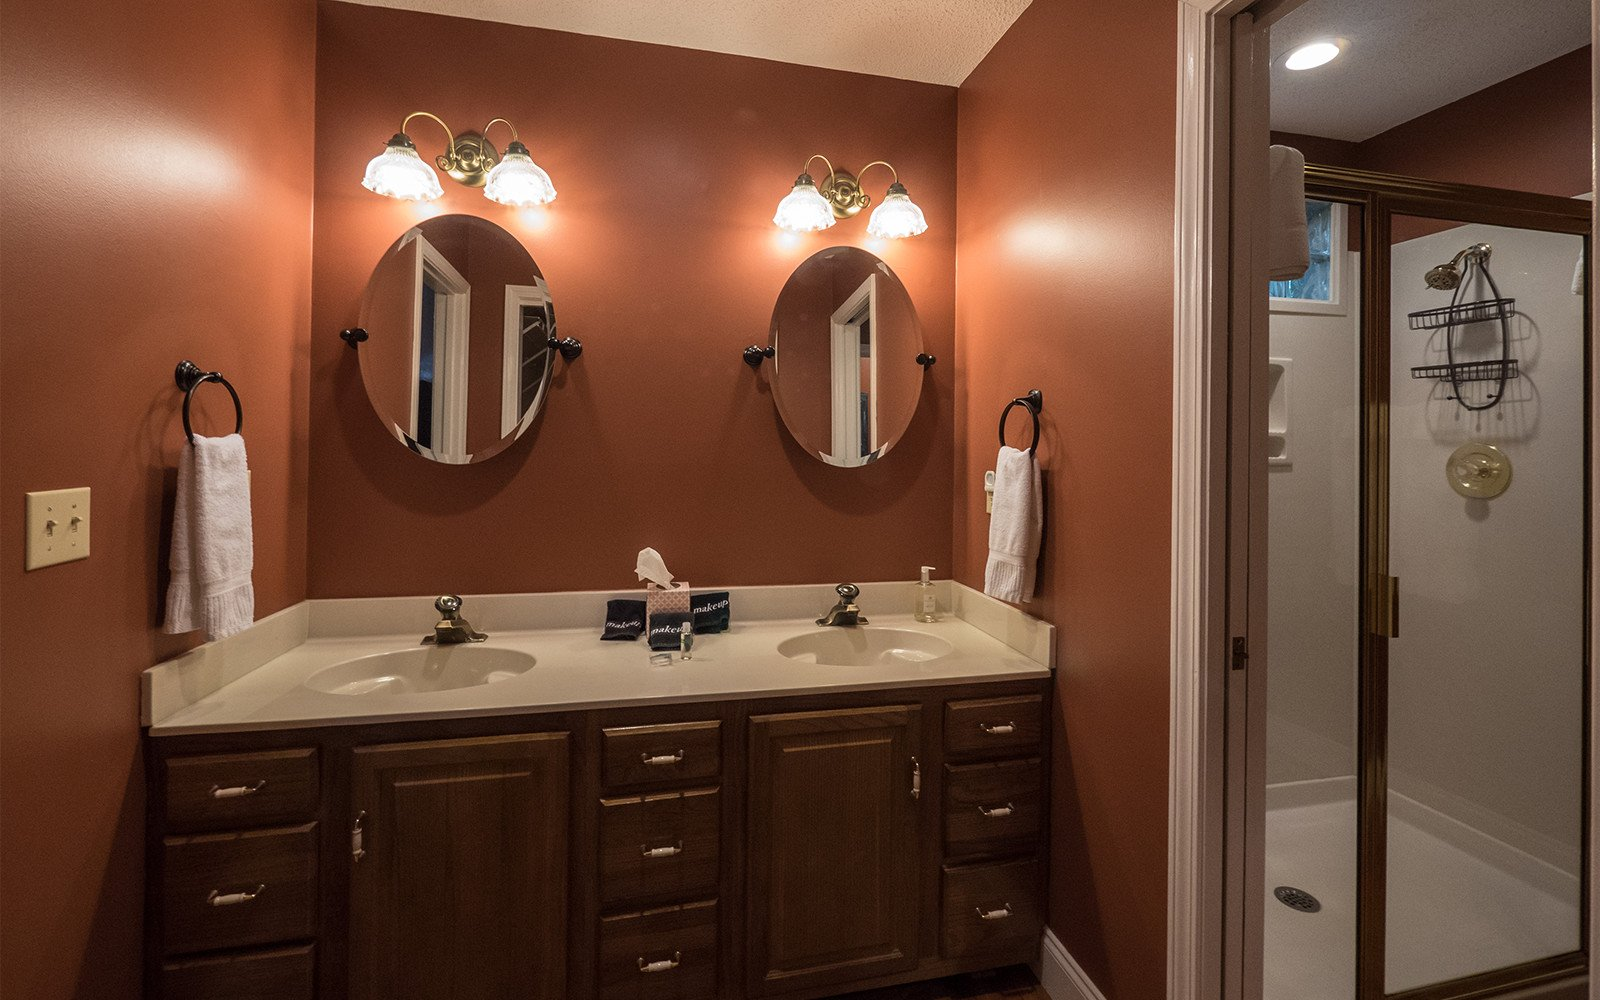 Master-bathroom-at-Hilt-St-house